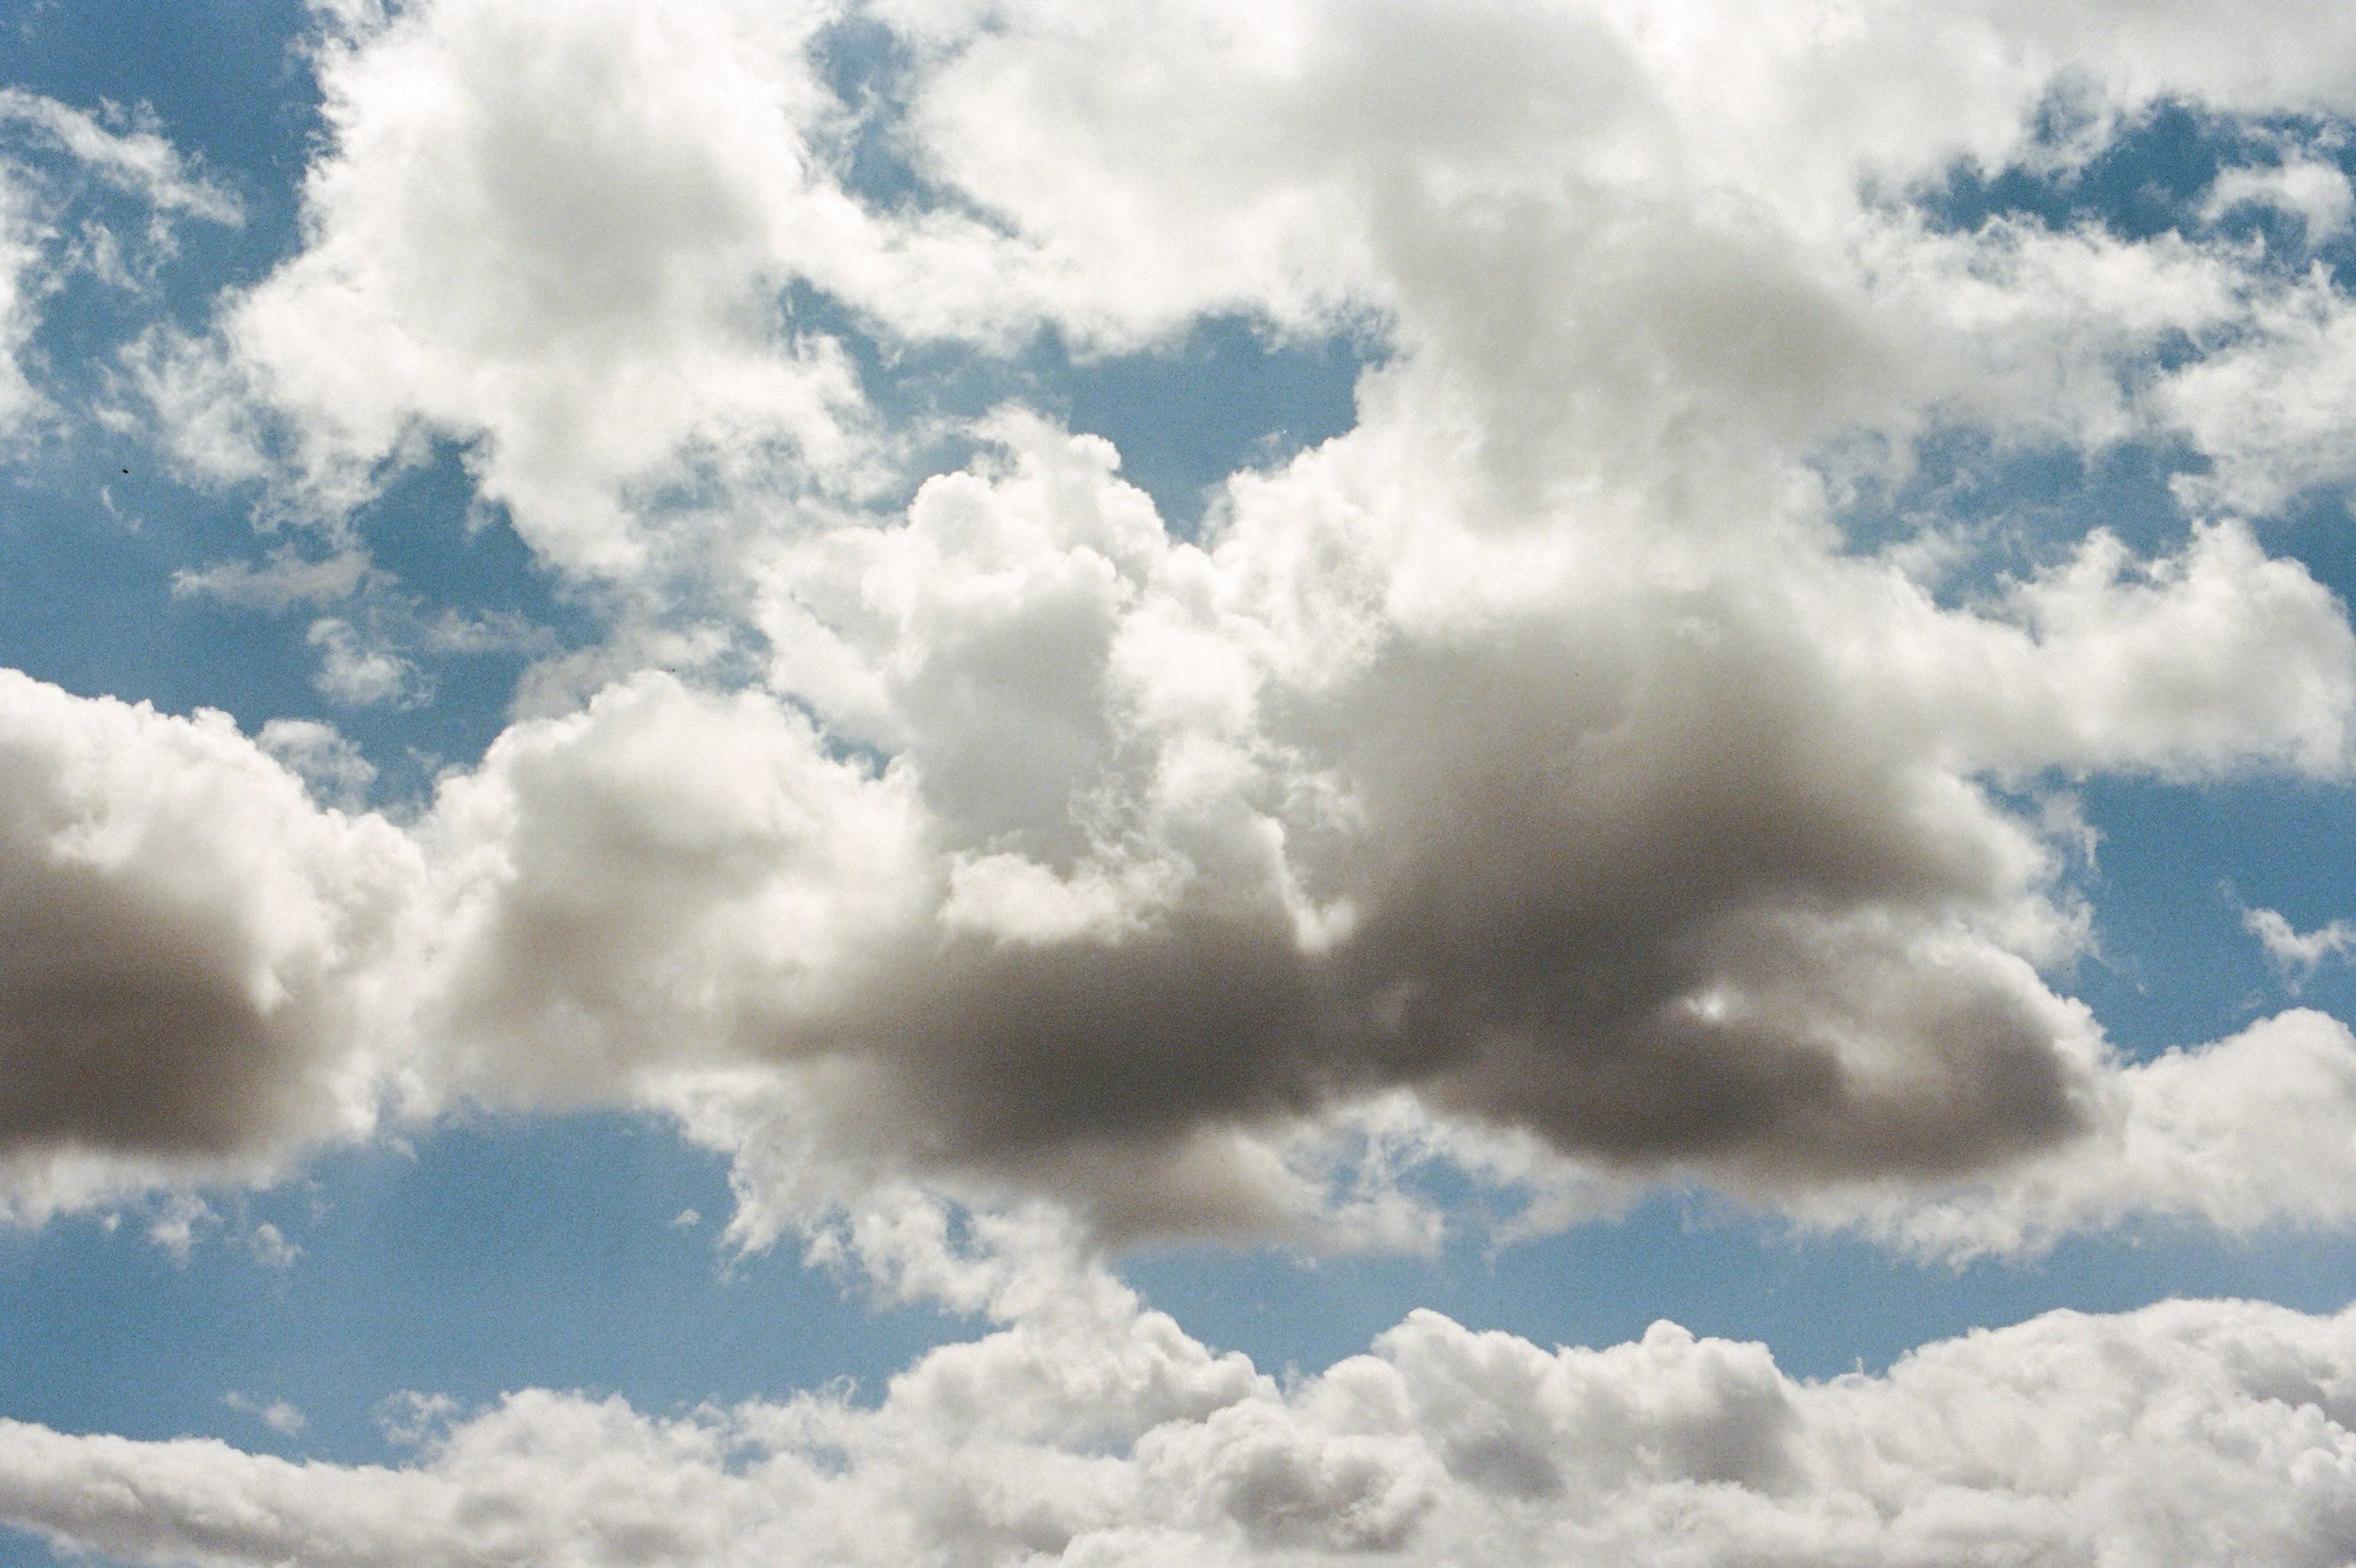 clouds_cloud_film_photographer_emily_walker_8.jpg